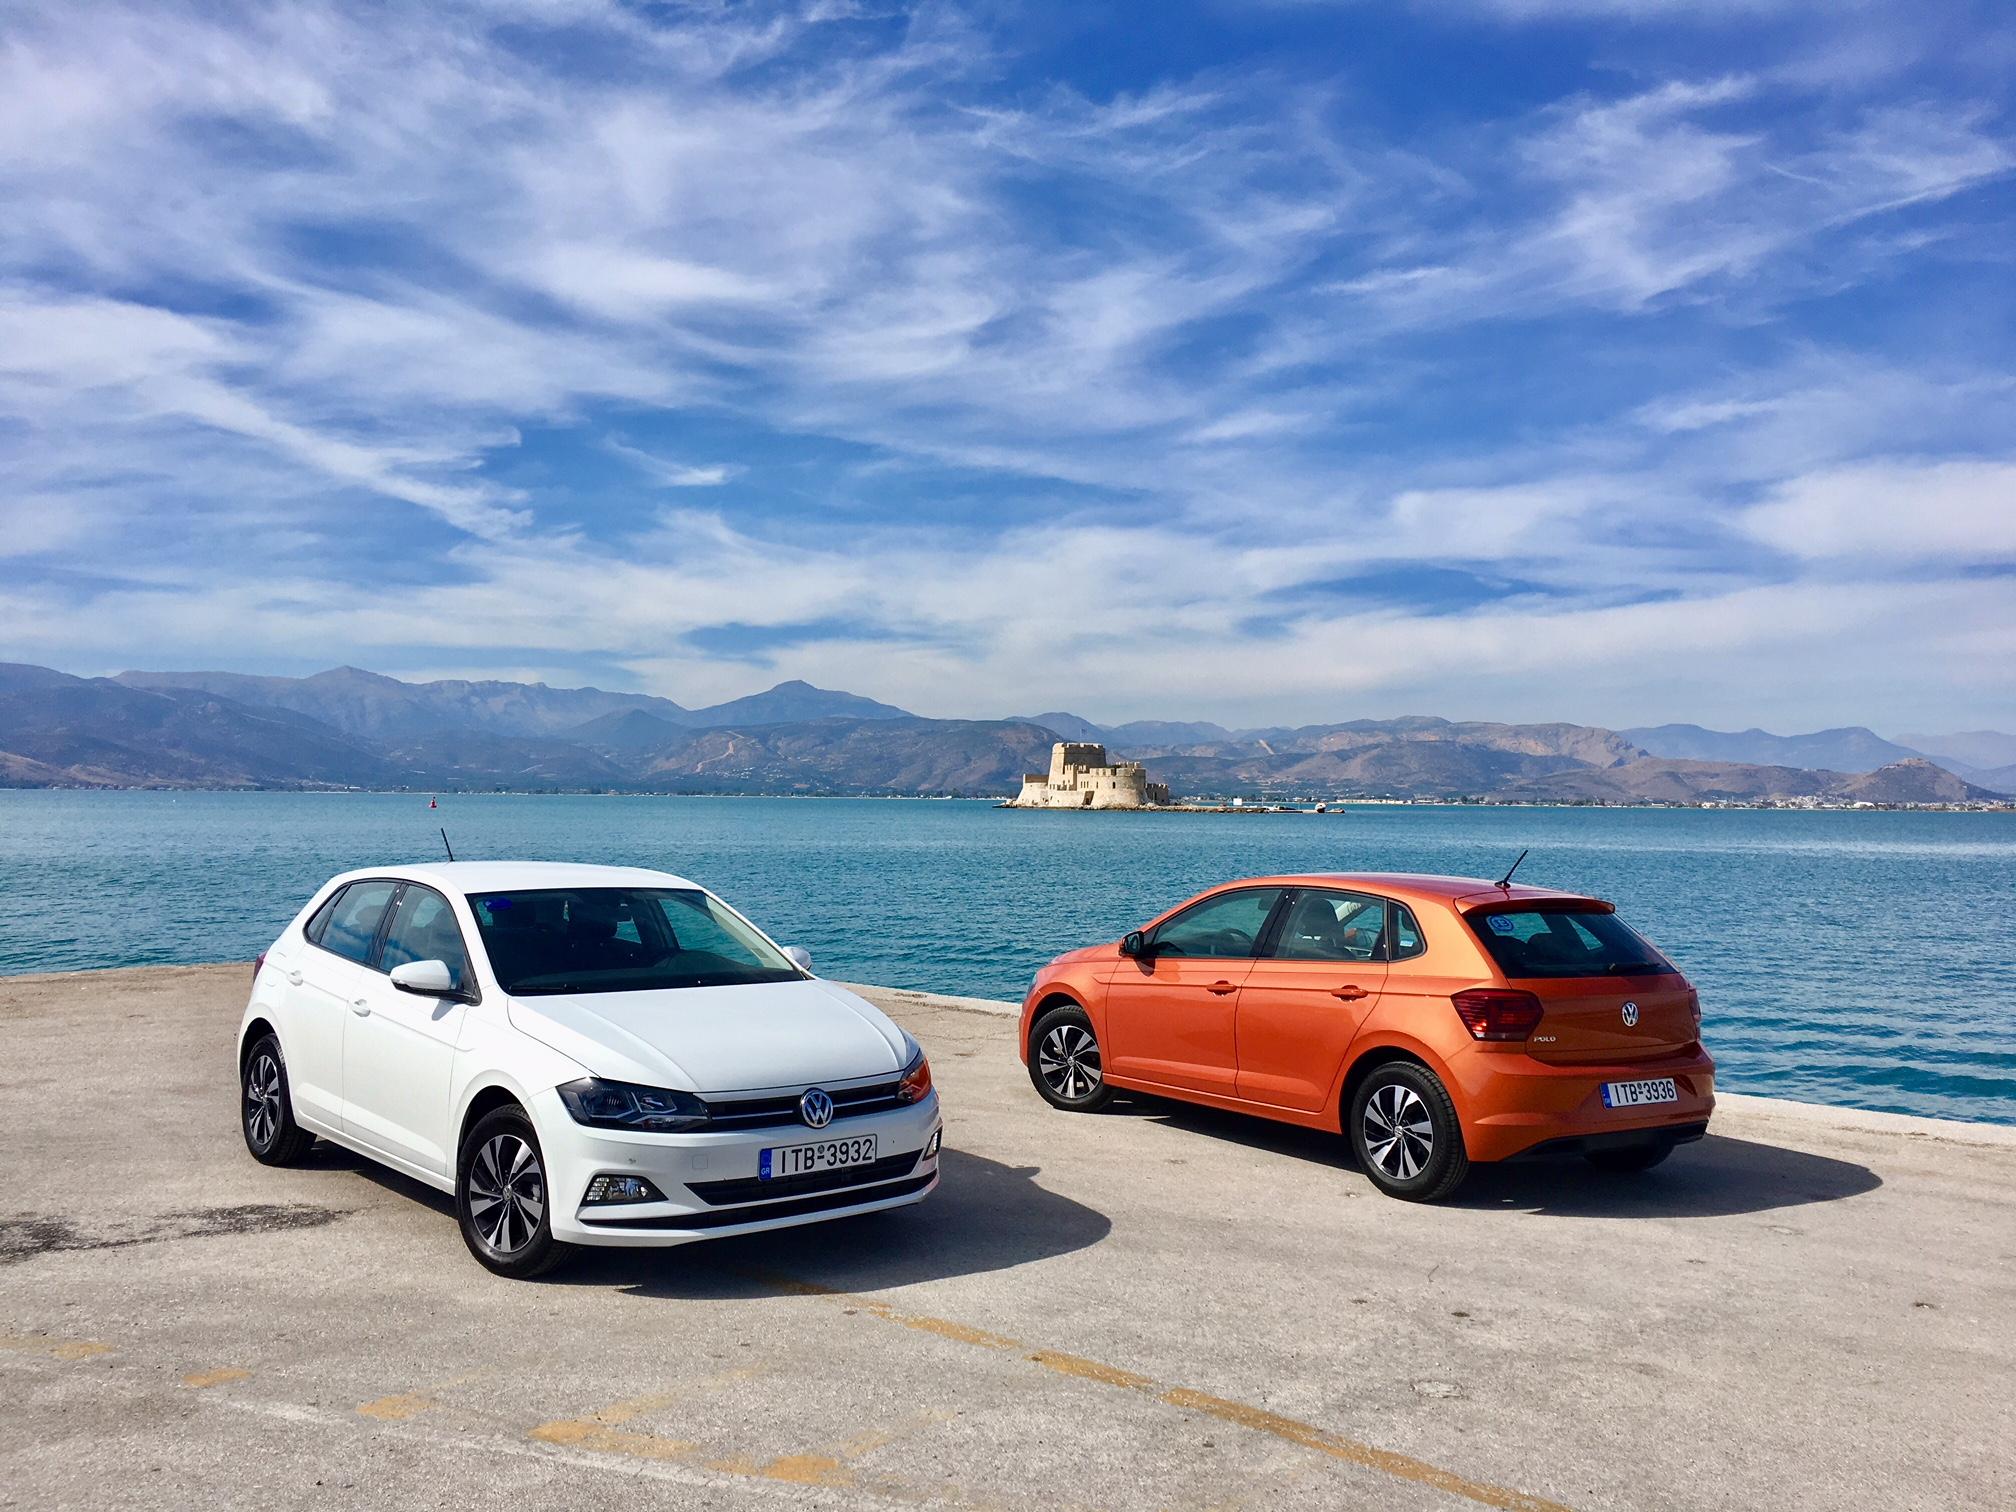 2c1e786b107a Οδηγούμε στην Ελλάδα το νέο VW Polo